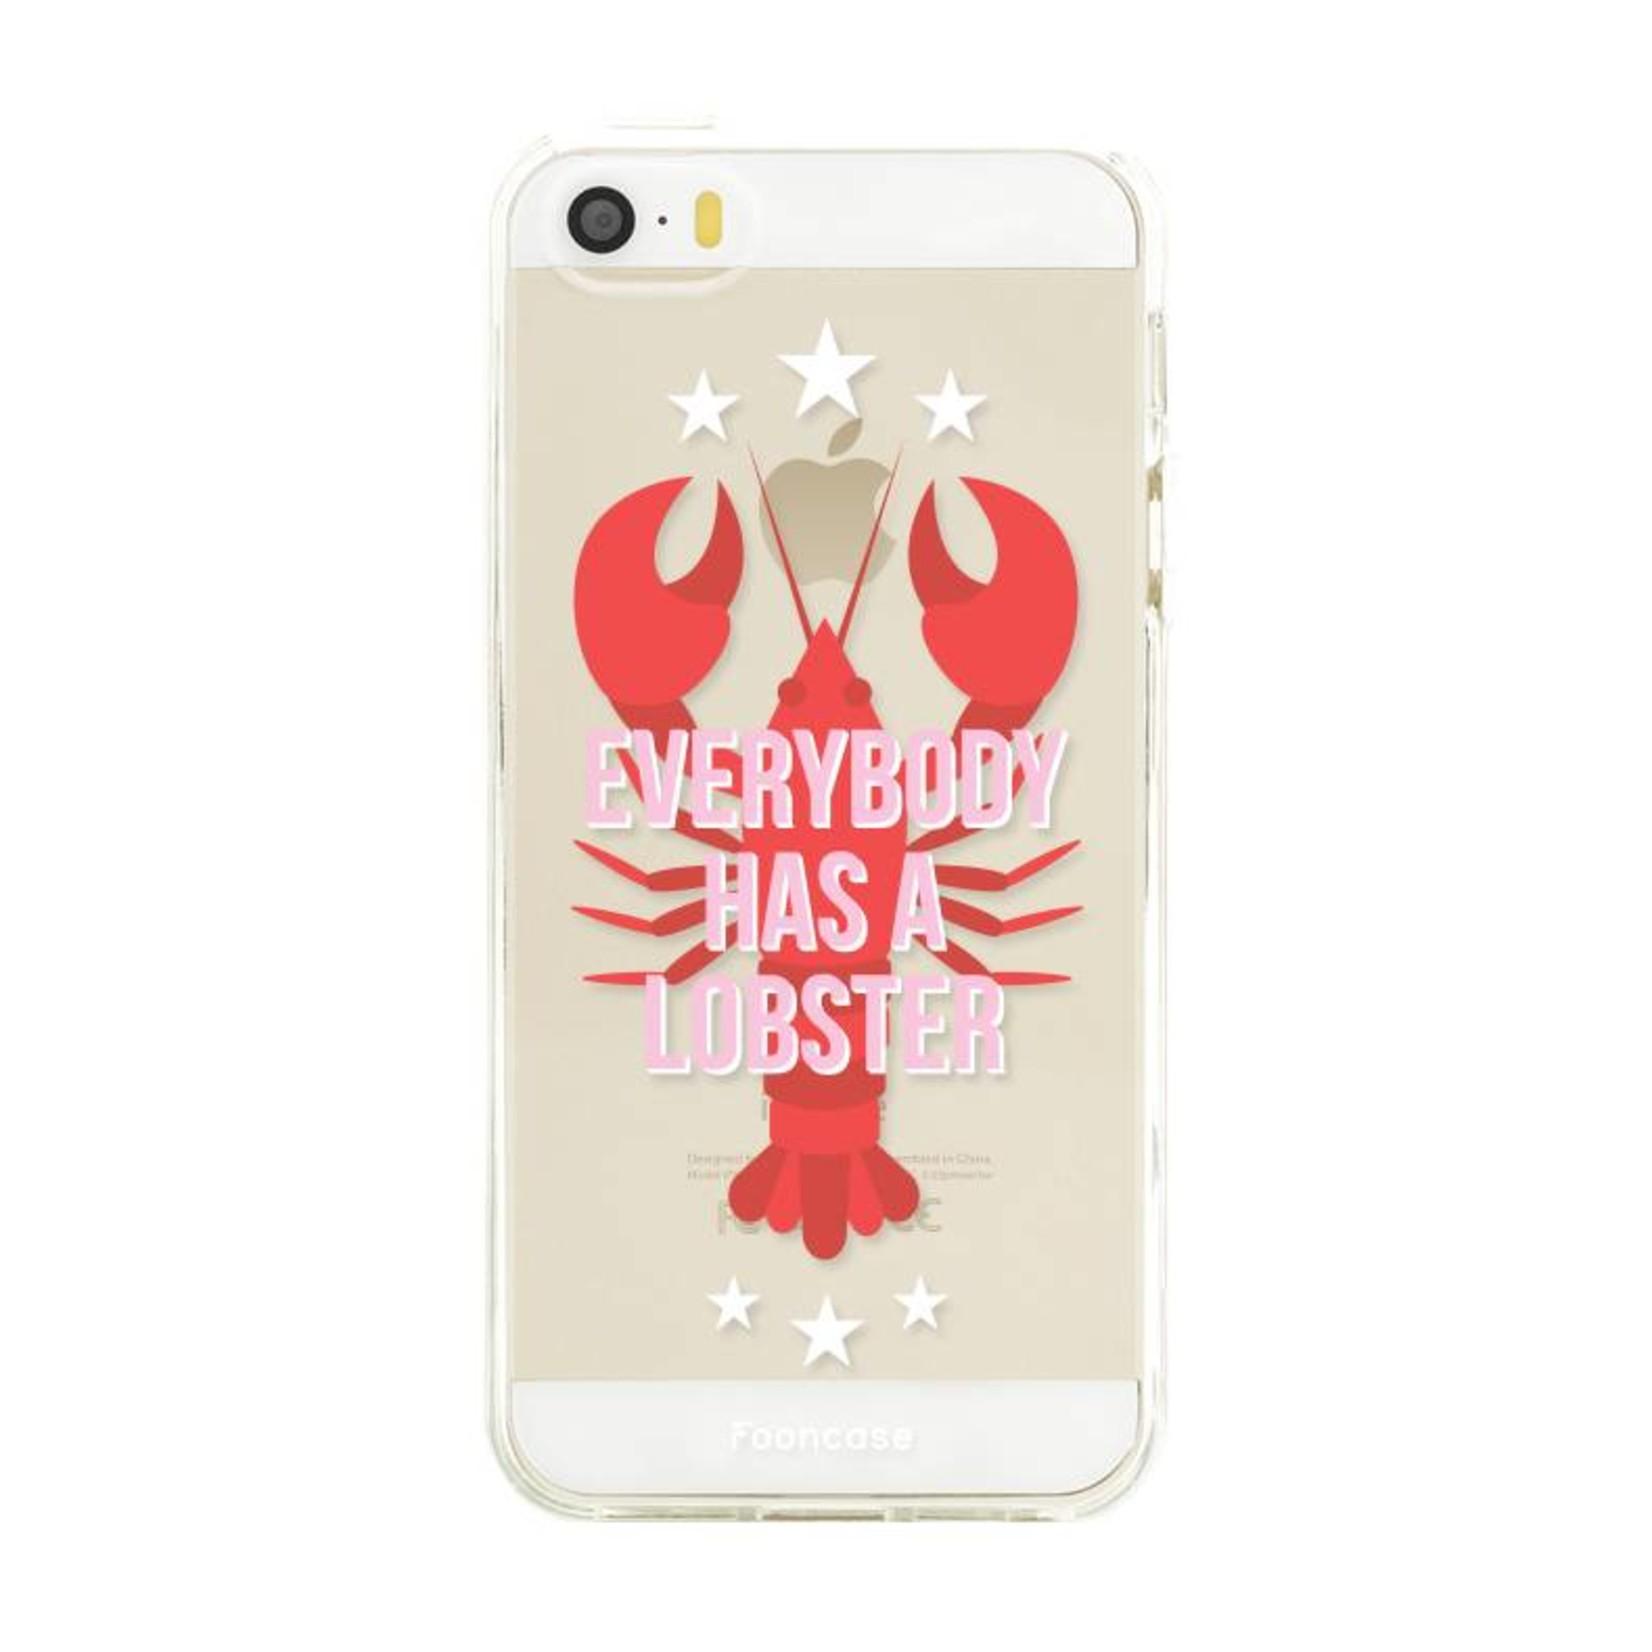 FOONCASE iPhone 5 / 5S hoesje TPU Soft Case - Back Cover - Lobster / Kreeft